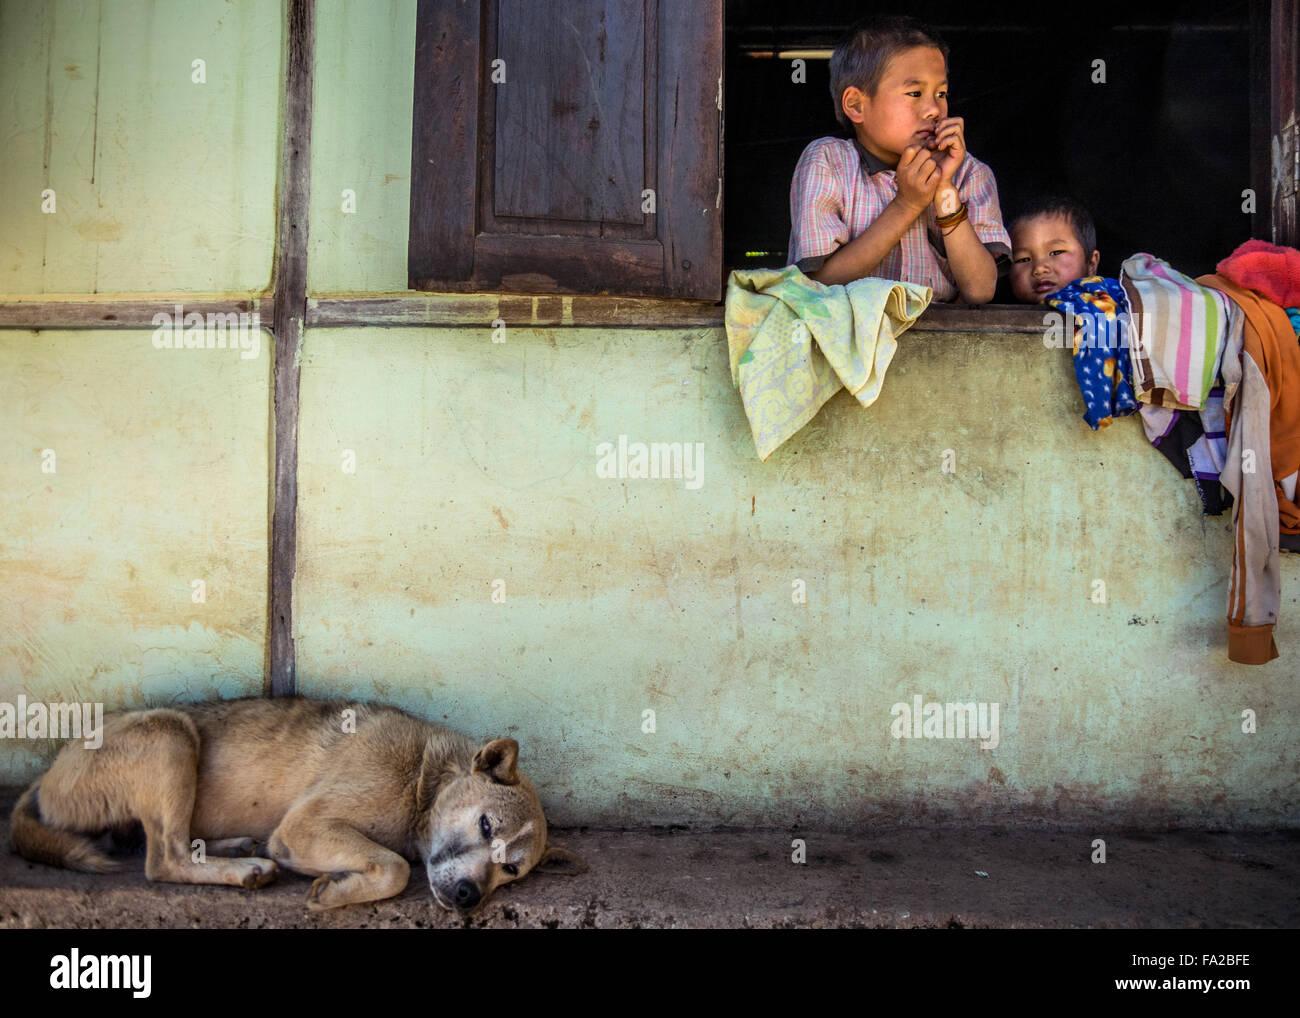 Filhos de Mianmar. (Estado de Shan, Mianmar, a Birmânia) Foto de Stock